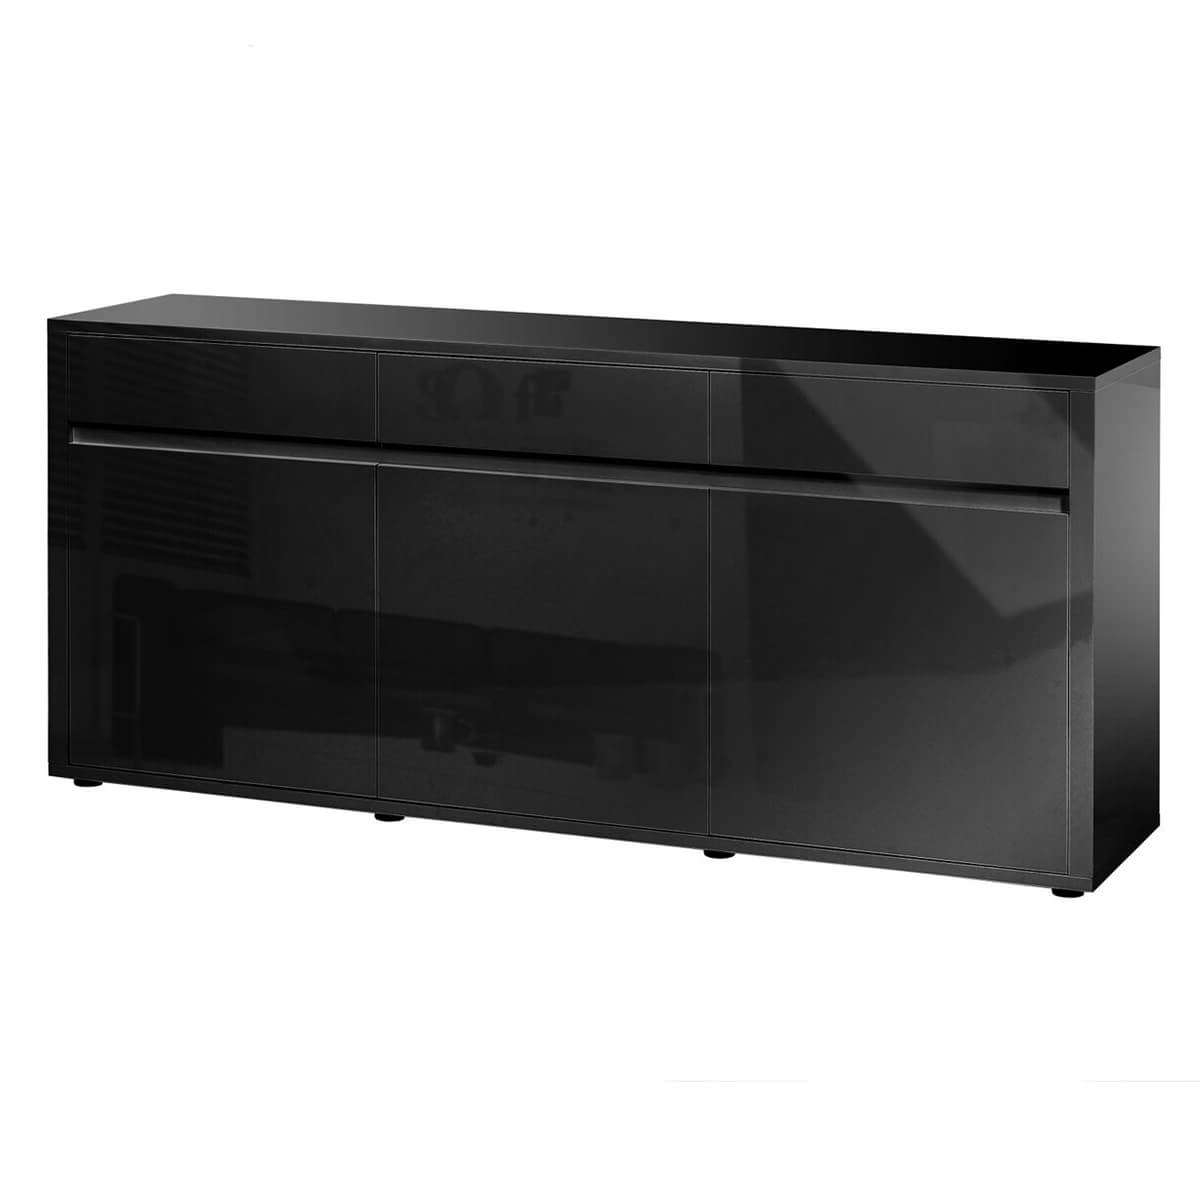 Urbana Black High Gloss Sideboard 3 Door 3 Drawer | Fads Regarding High Gloss Sideboards (Gallery 14 of 20)